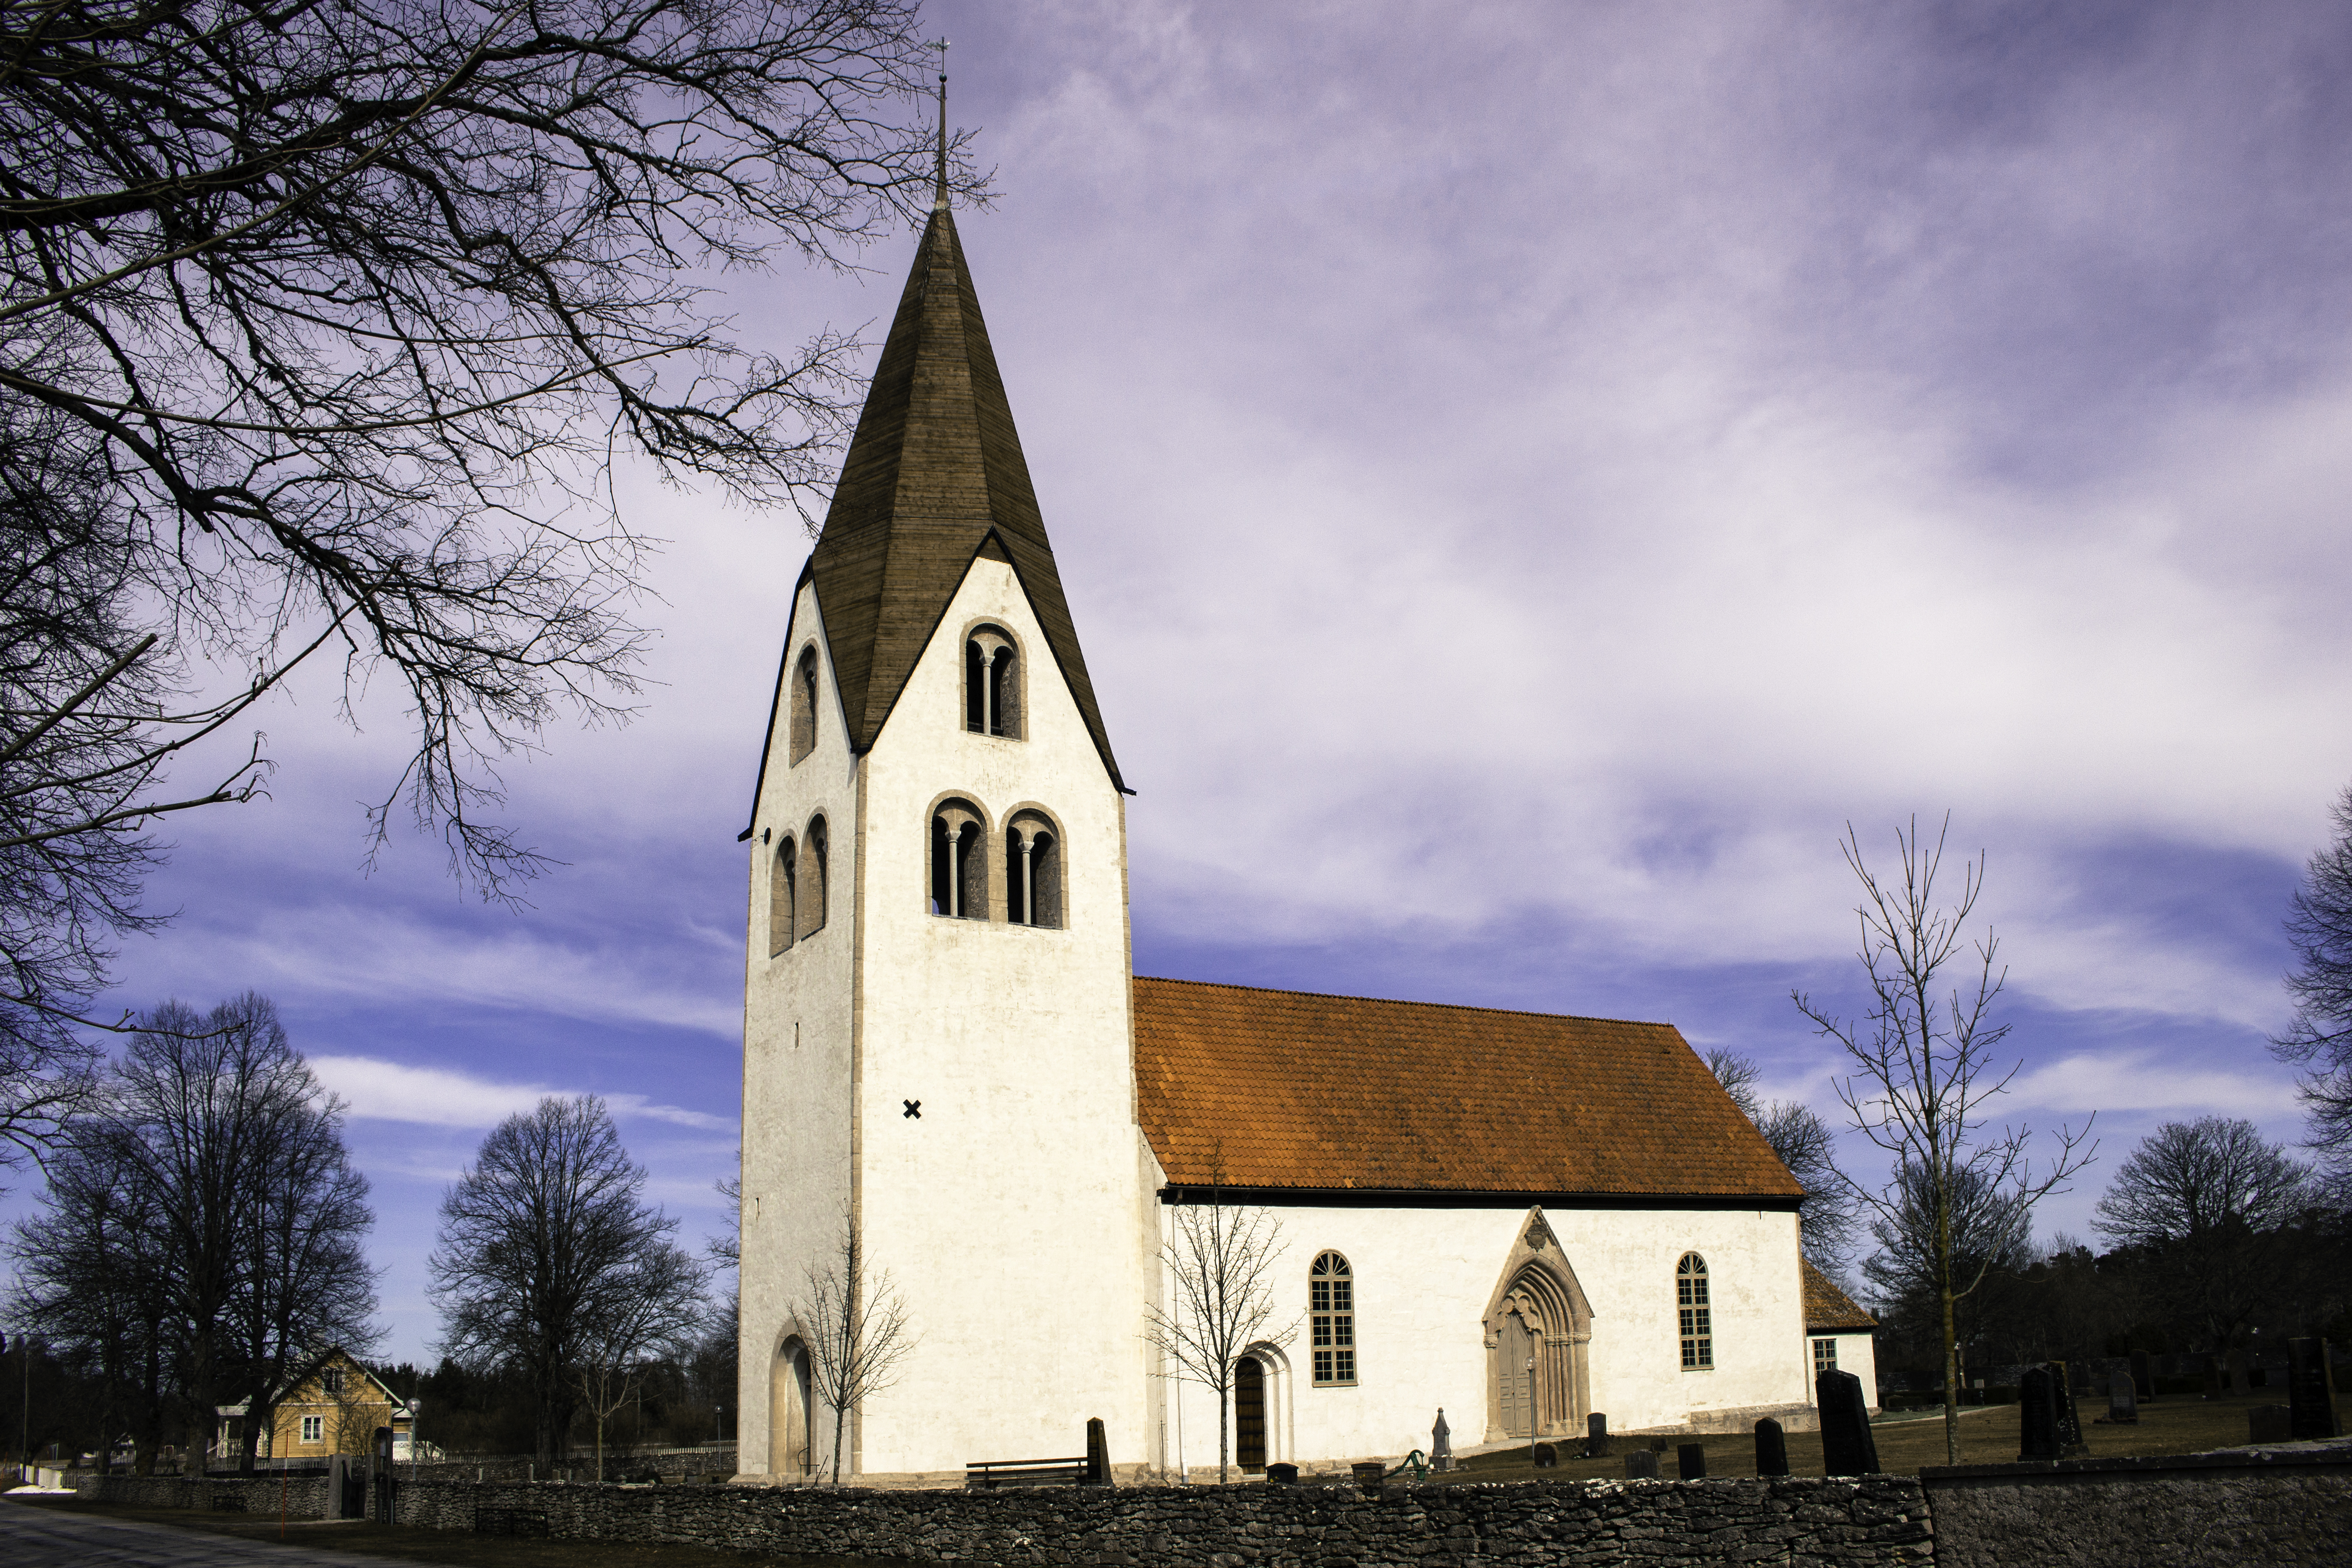 Eskelhem Gotlands Tofta karta - tapissier-lanoe.com